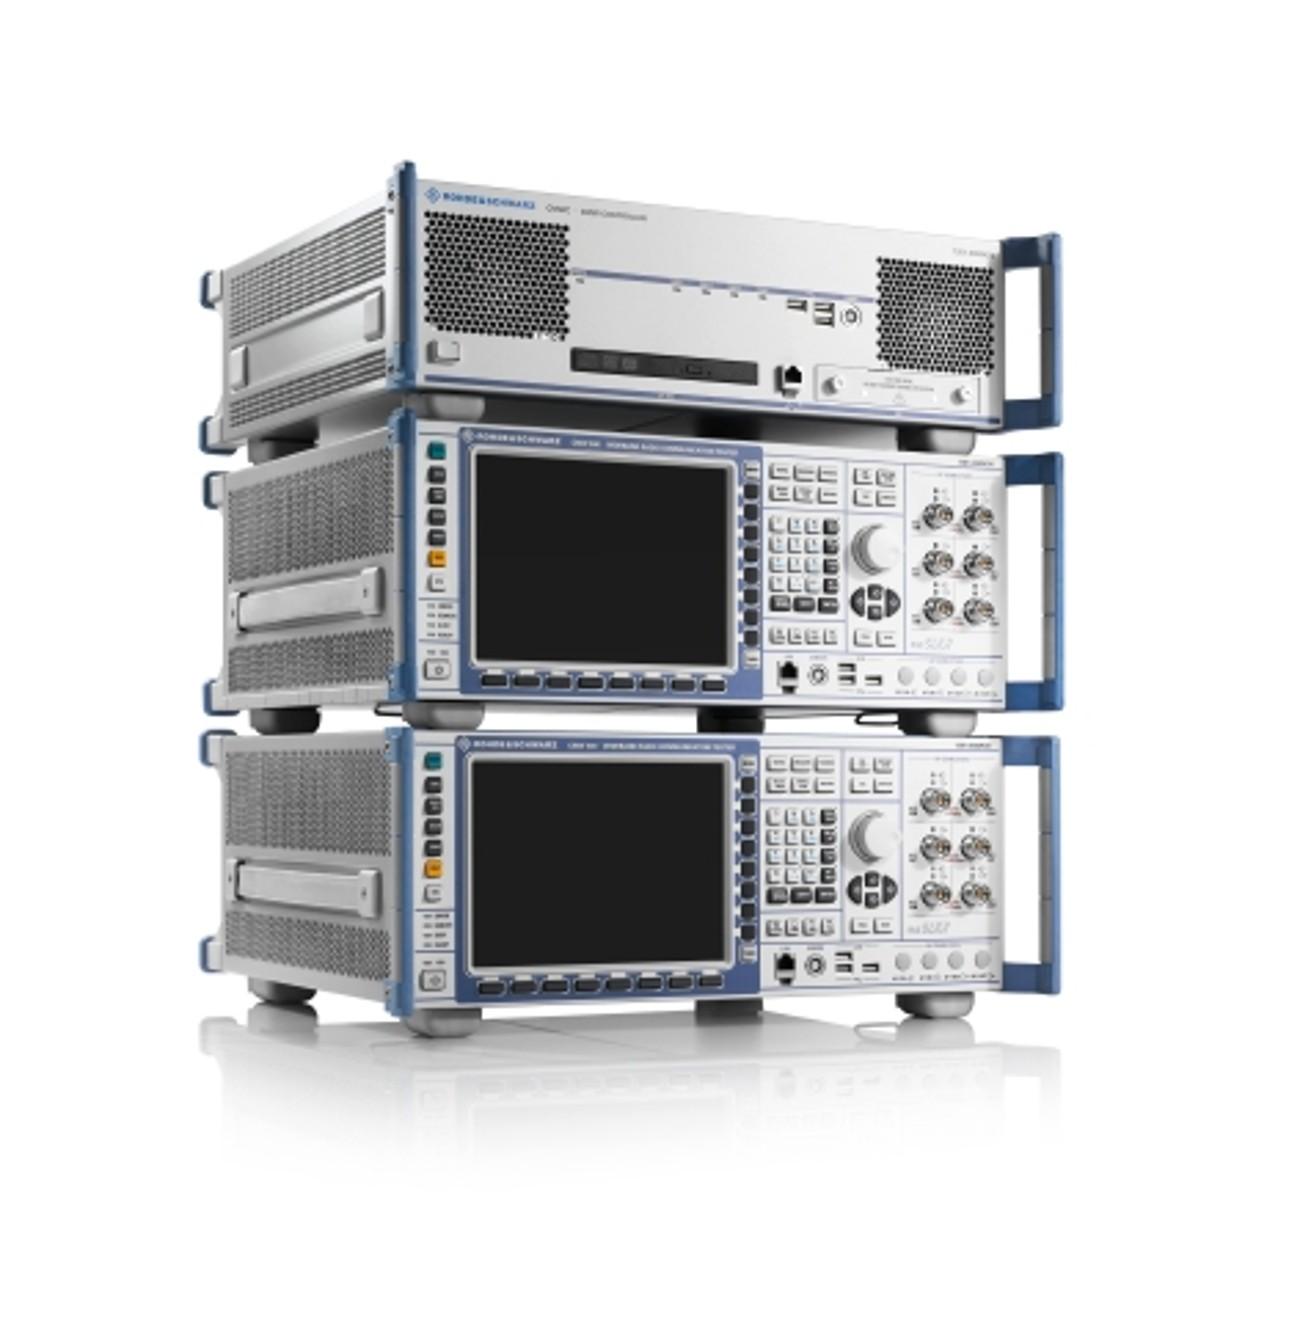 Rohde & Schwarz will present radiocommunications test